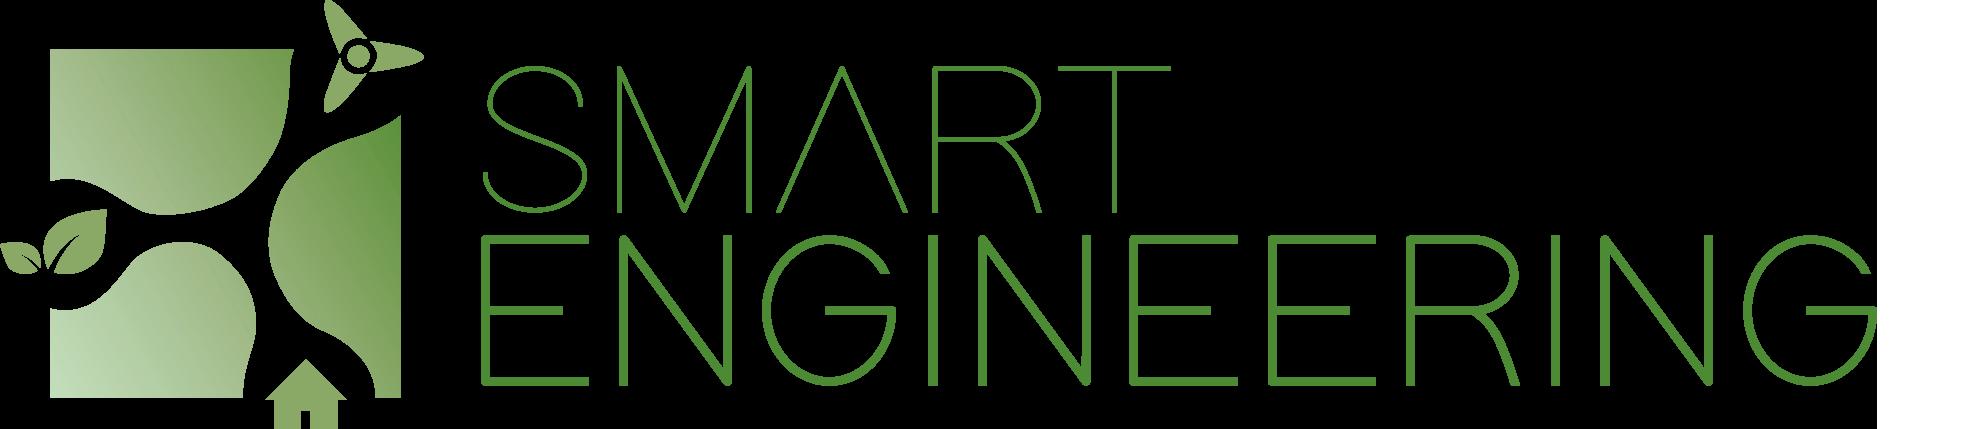 Smart Engineering GmbH